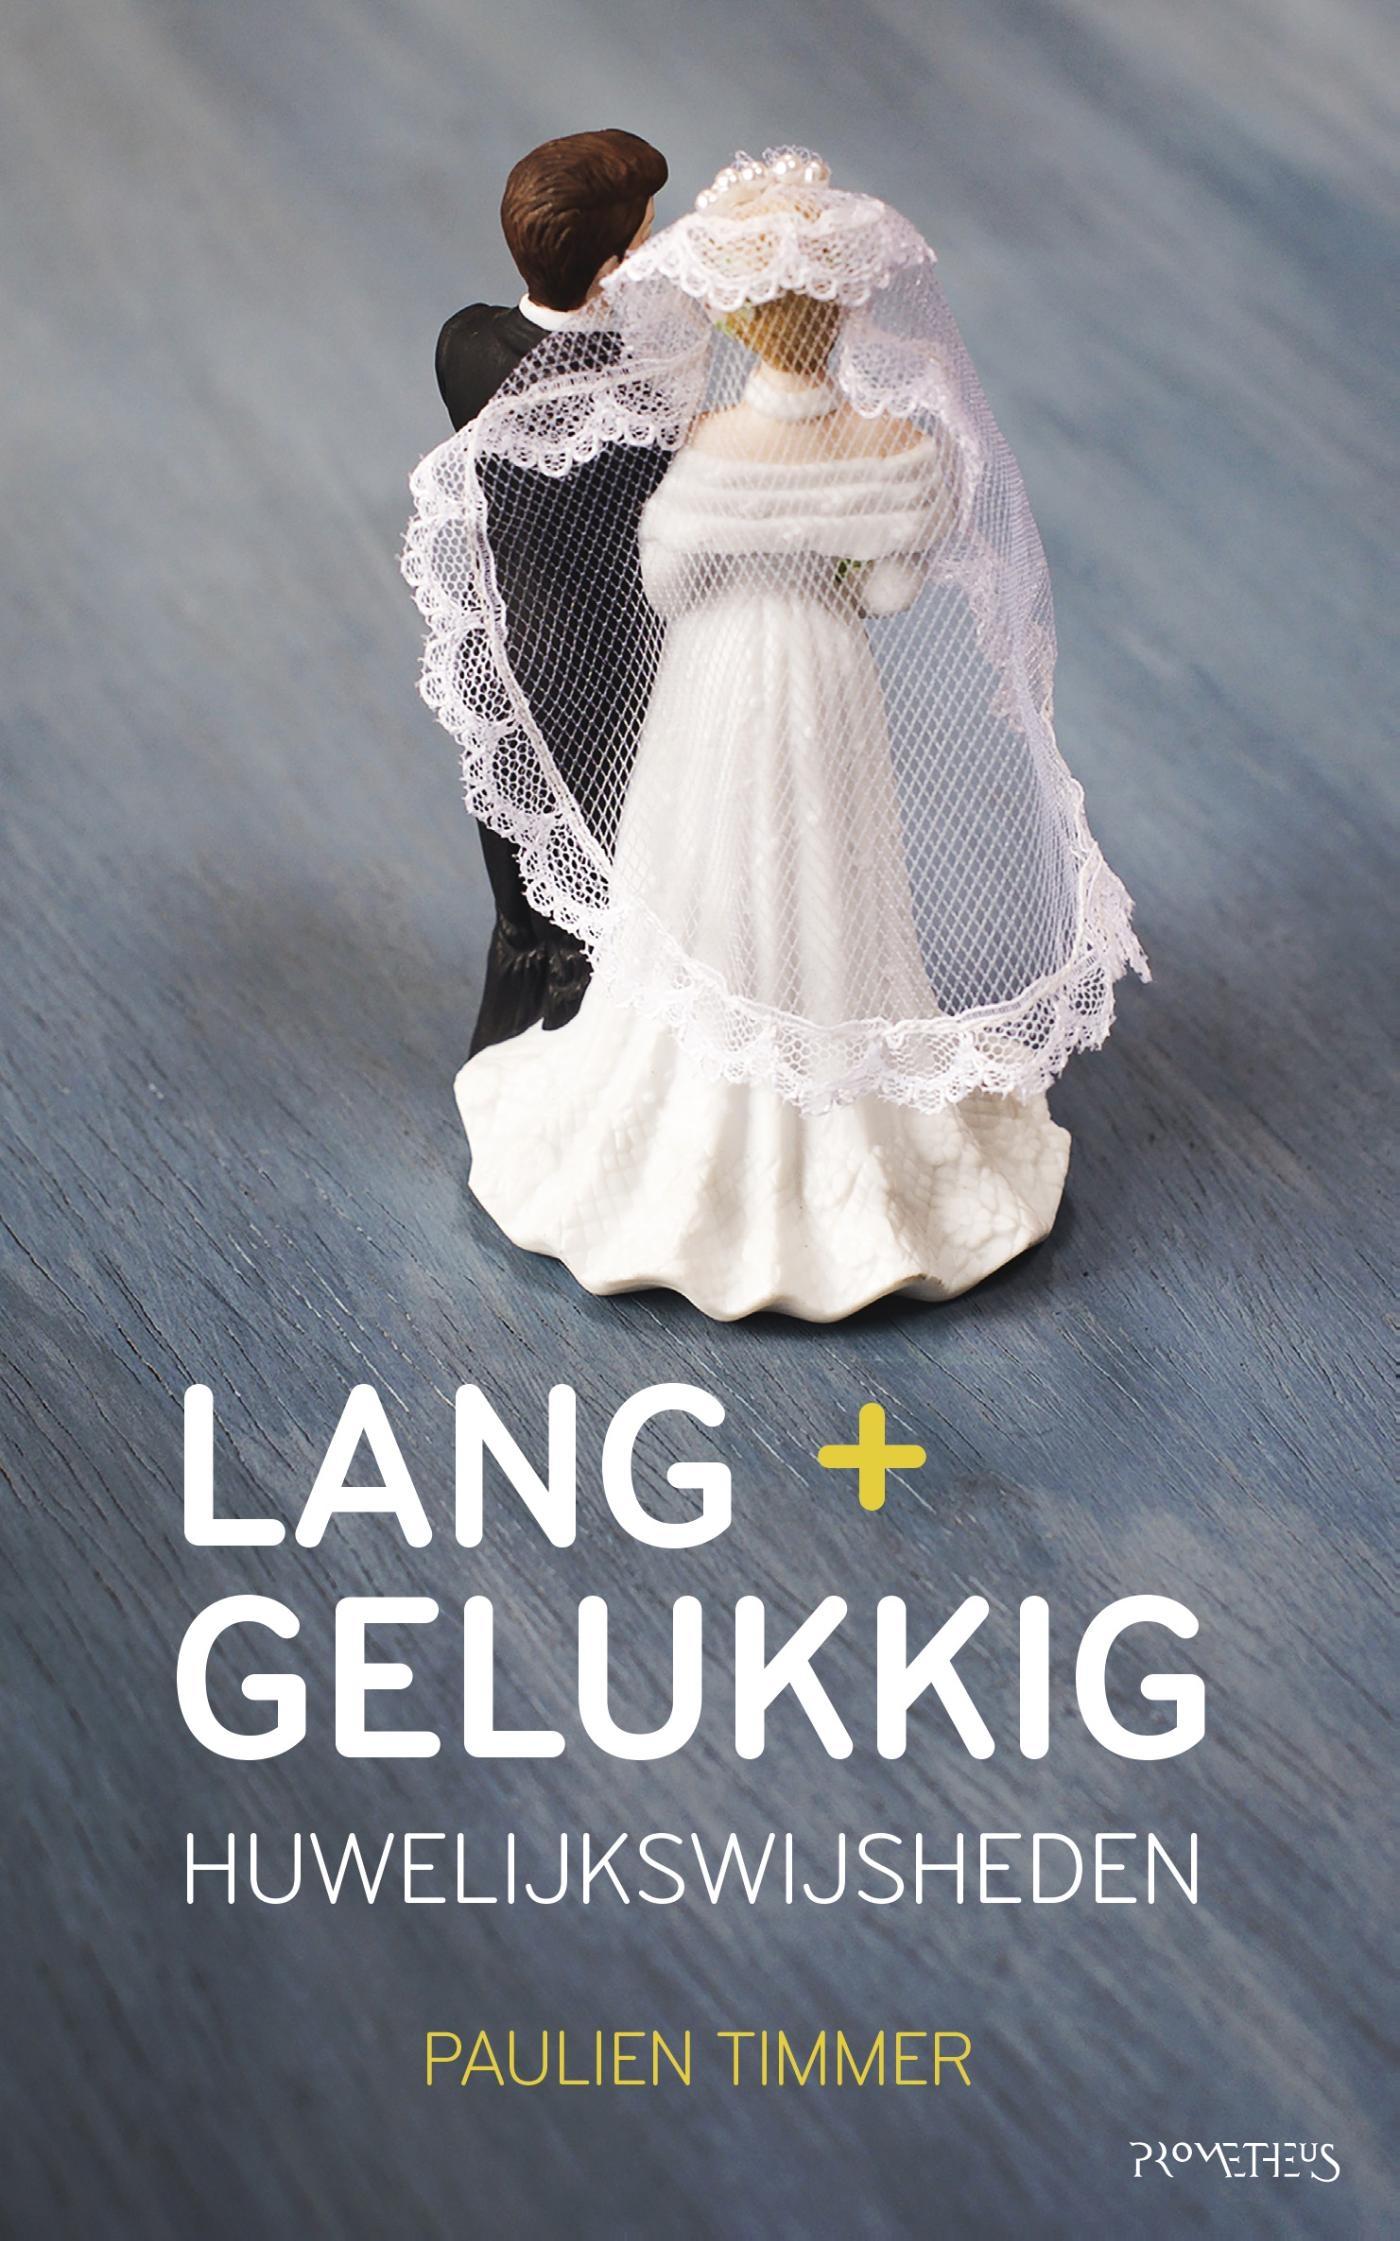 Lang + gelukkig – Paulien Timmer